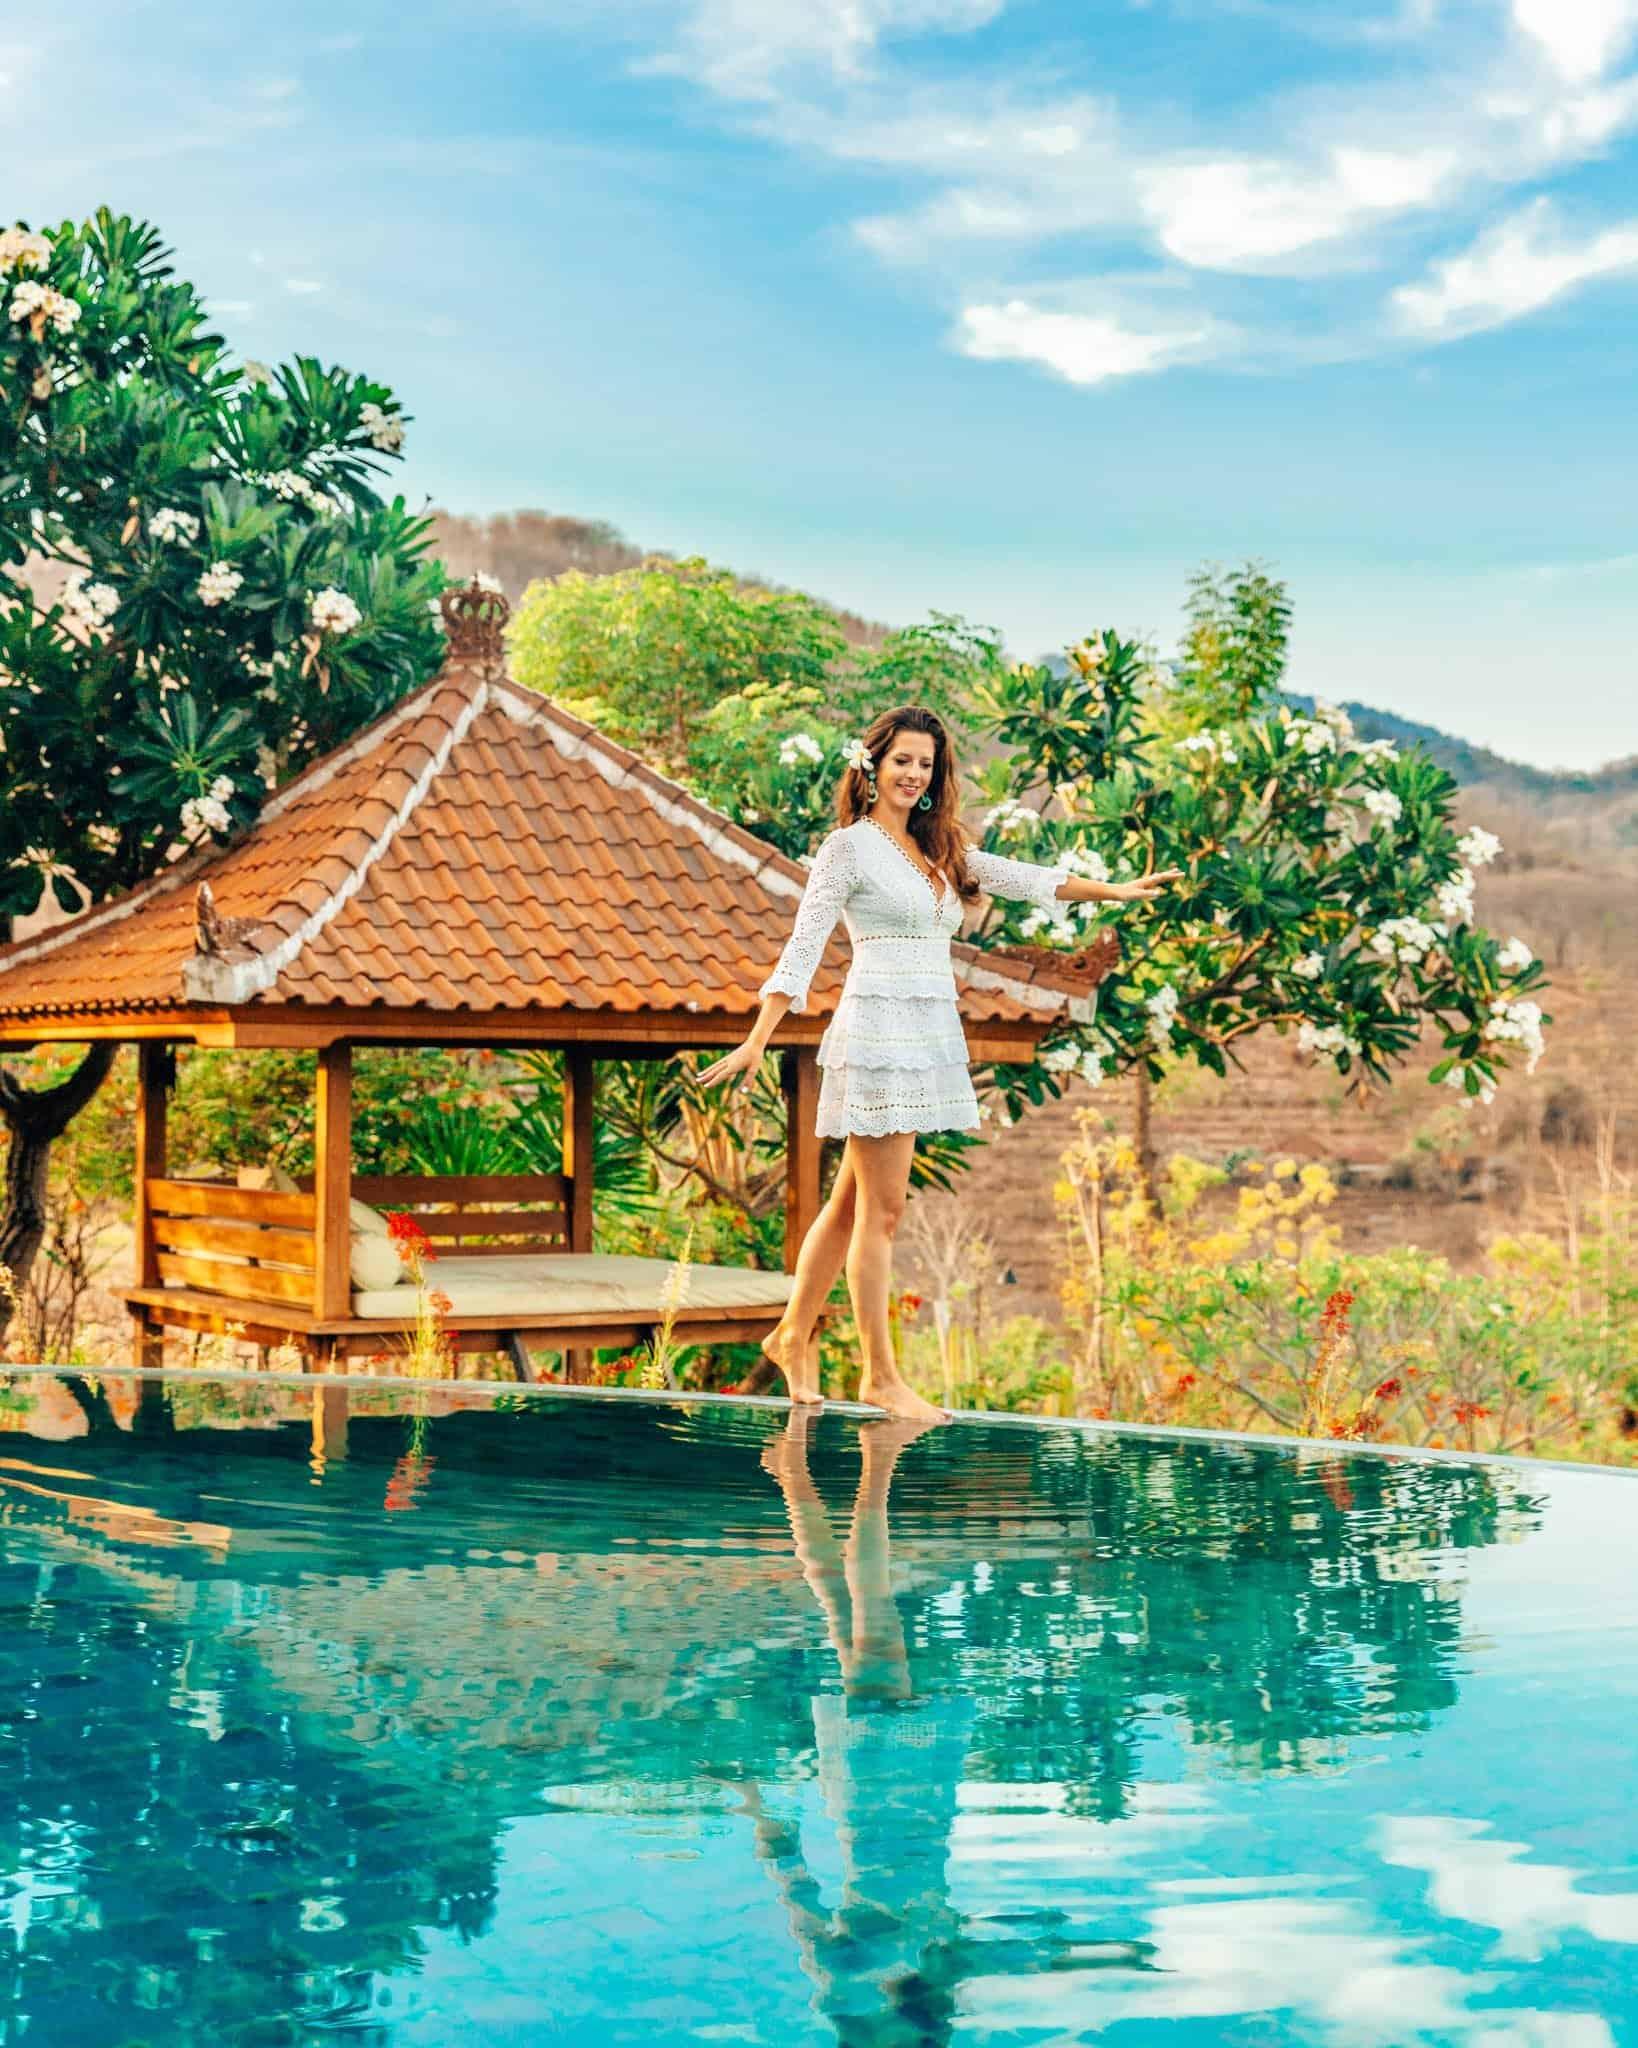 Pool View at Sumberkima Hill, Bali - The Next Trip